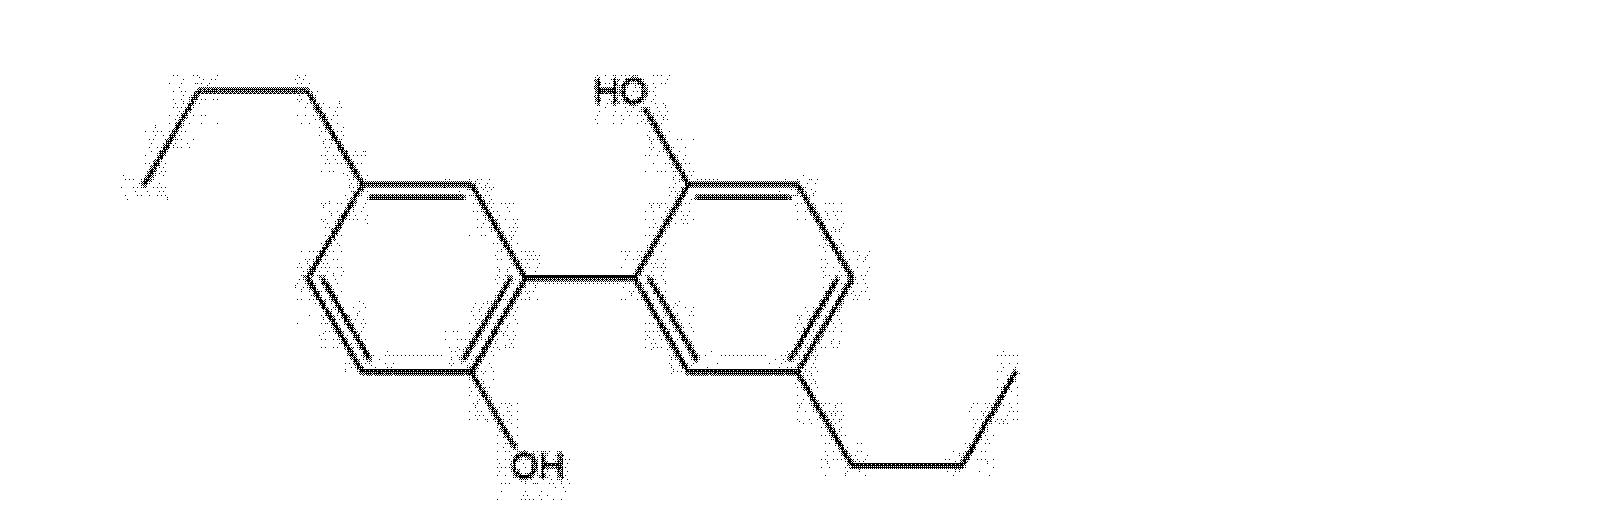 CN103025305A - 包含木蘭樹皮提取物或其合成類似物的口腔護理組合物 - Google Patents